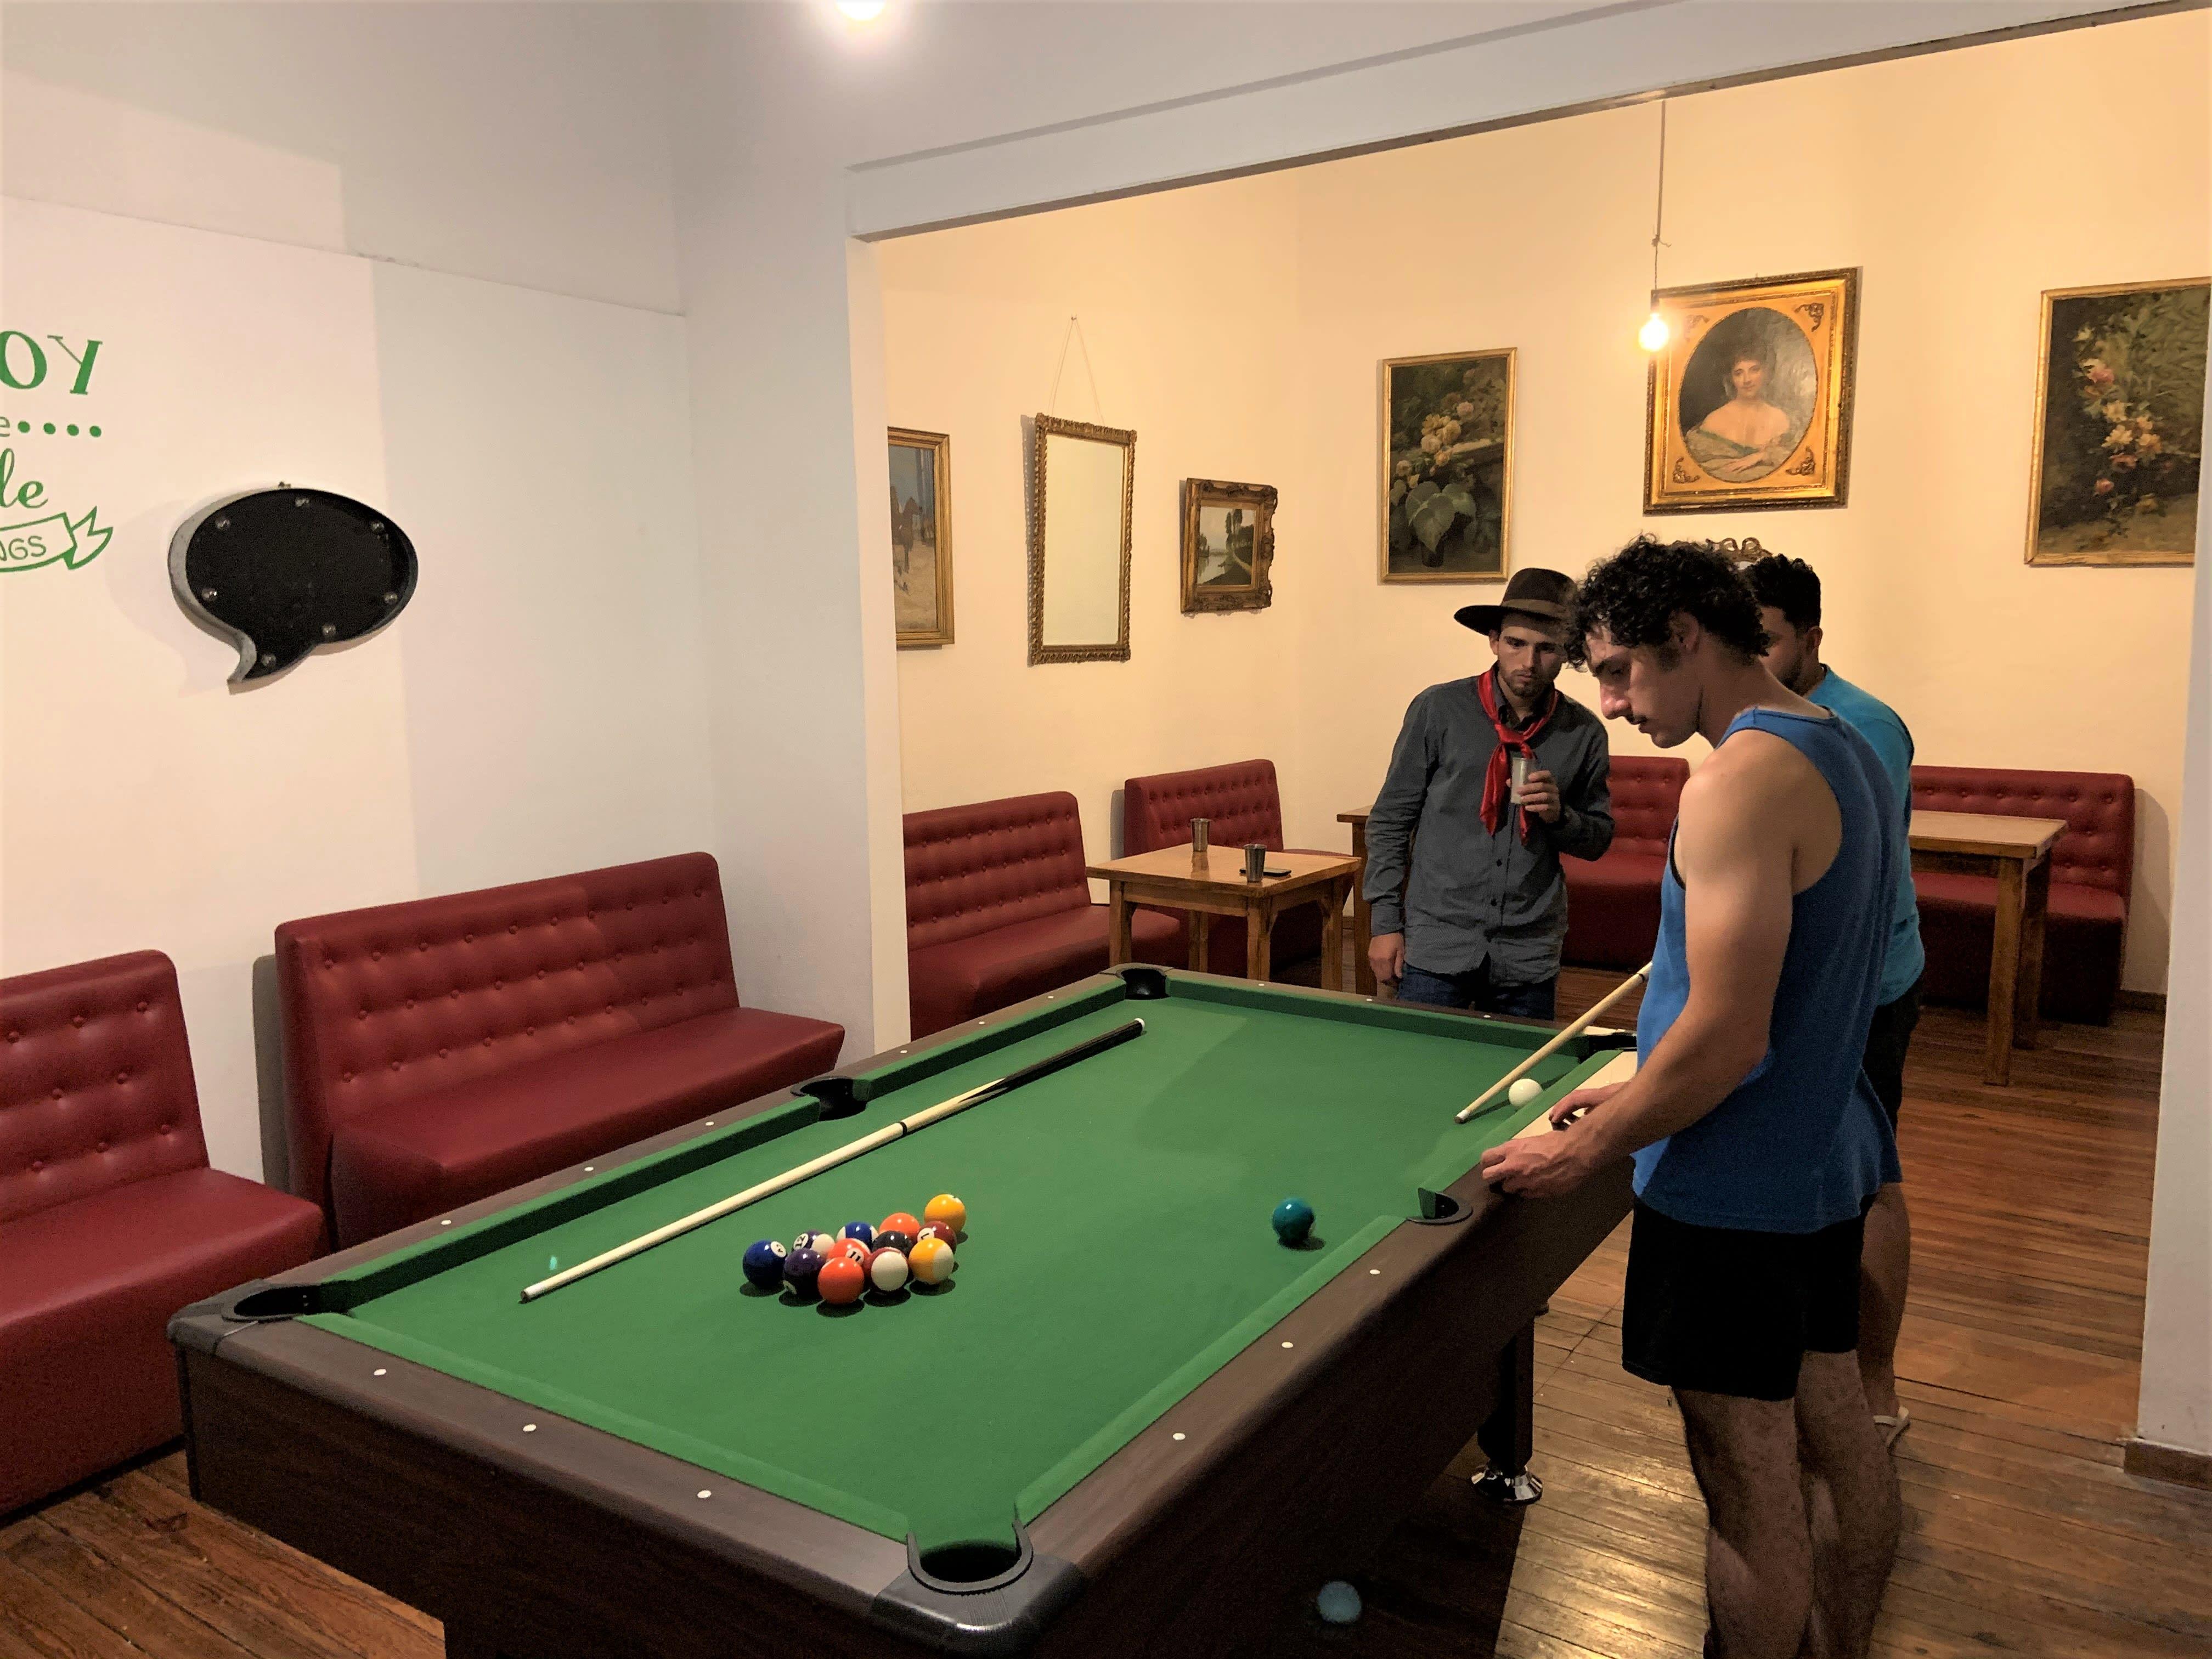 HOSTEL - Students Hostel